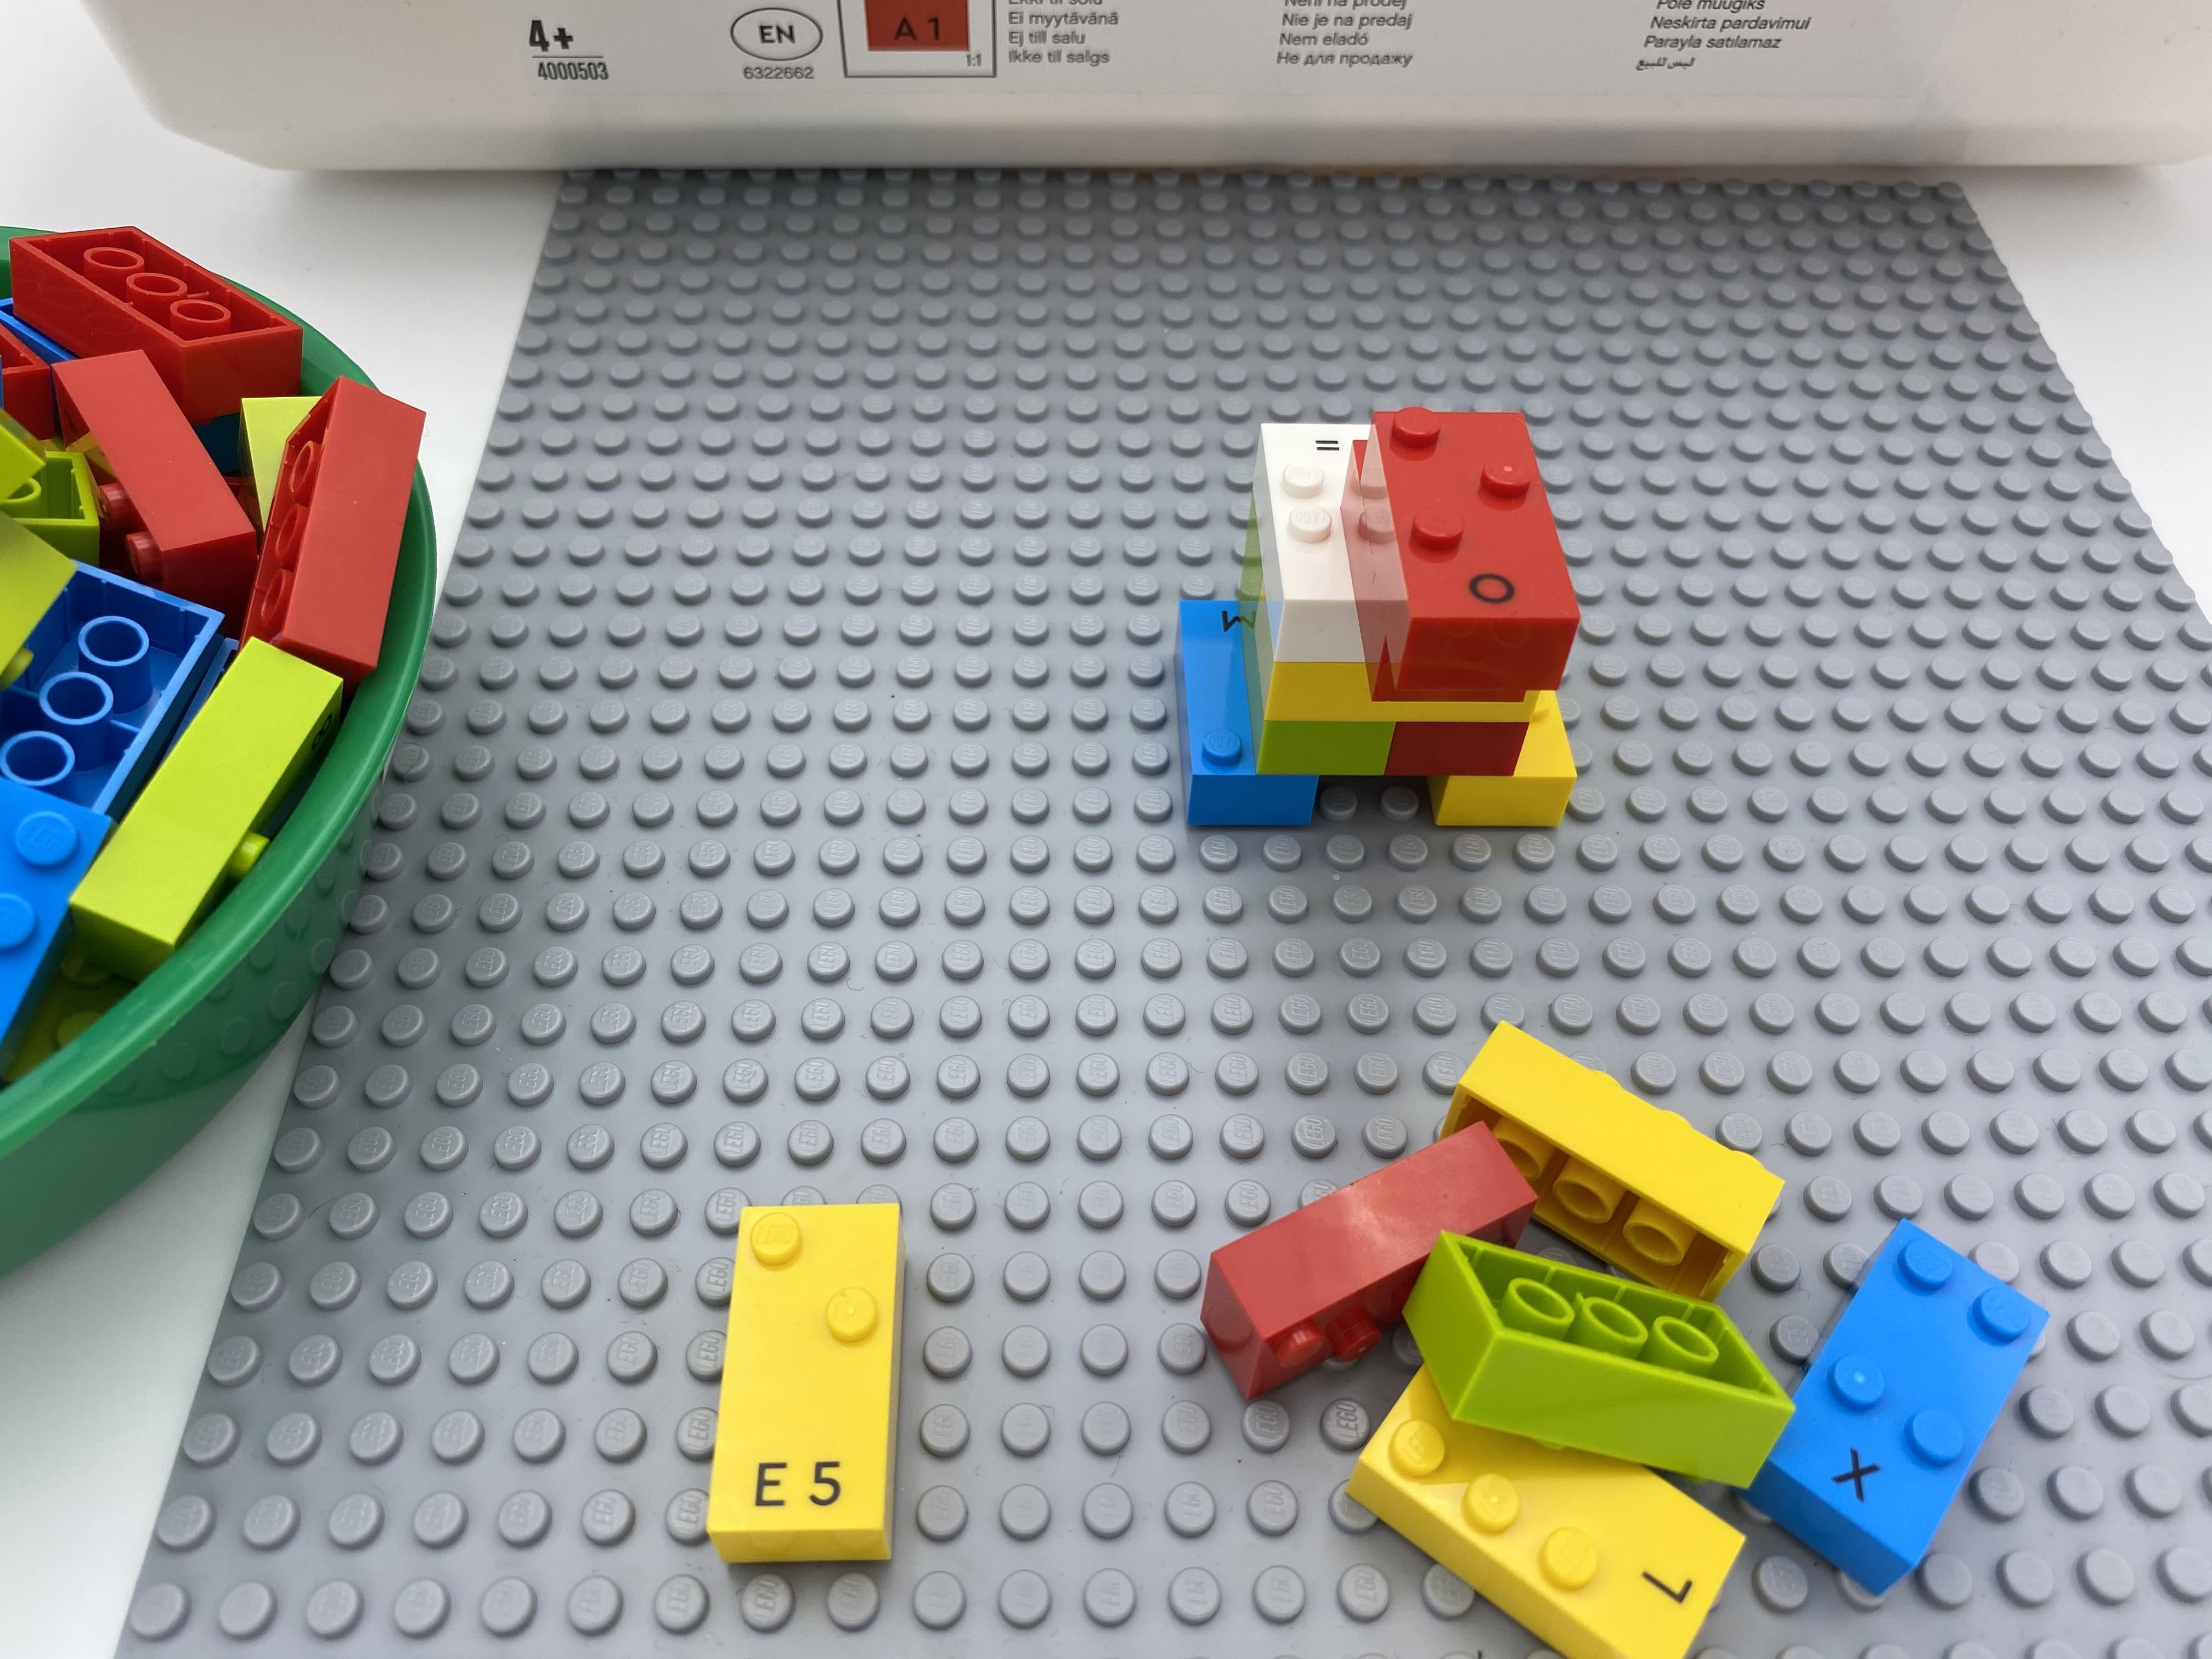 A bull made of 10 bricks, number brick 5, 5 random bricks on the base plate.